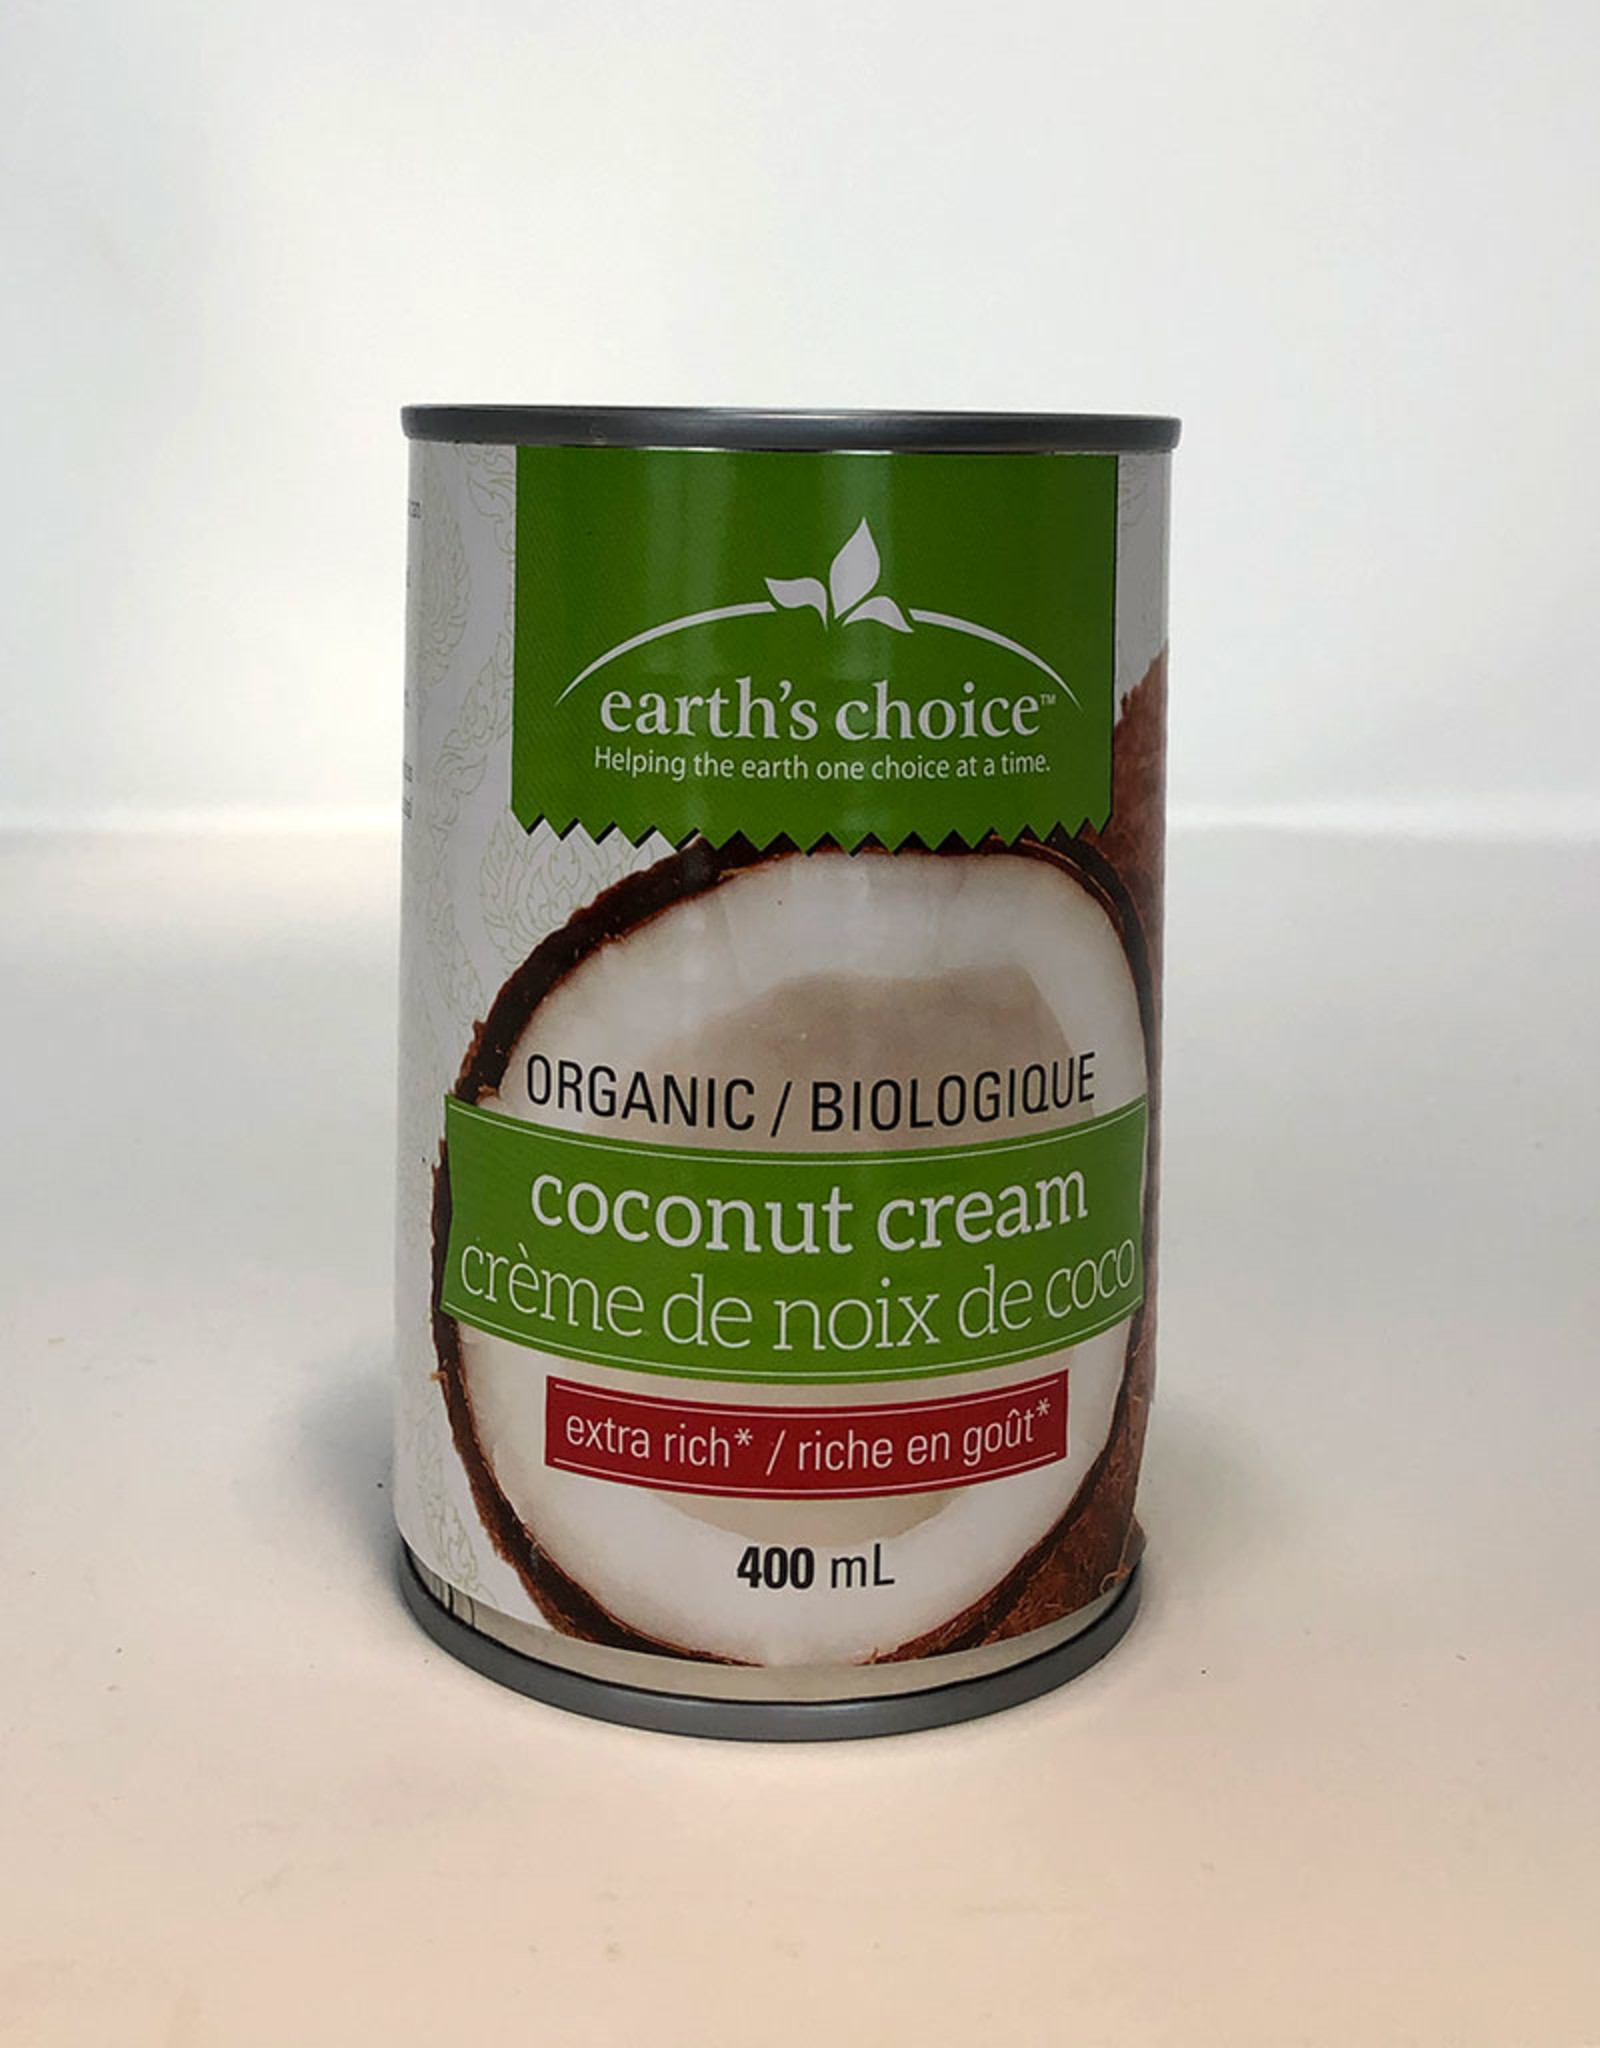 Earth's Choice Earths Choice - Organic Coconut Cream (400ml)